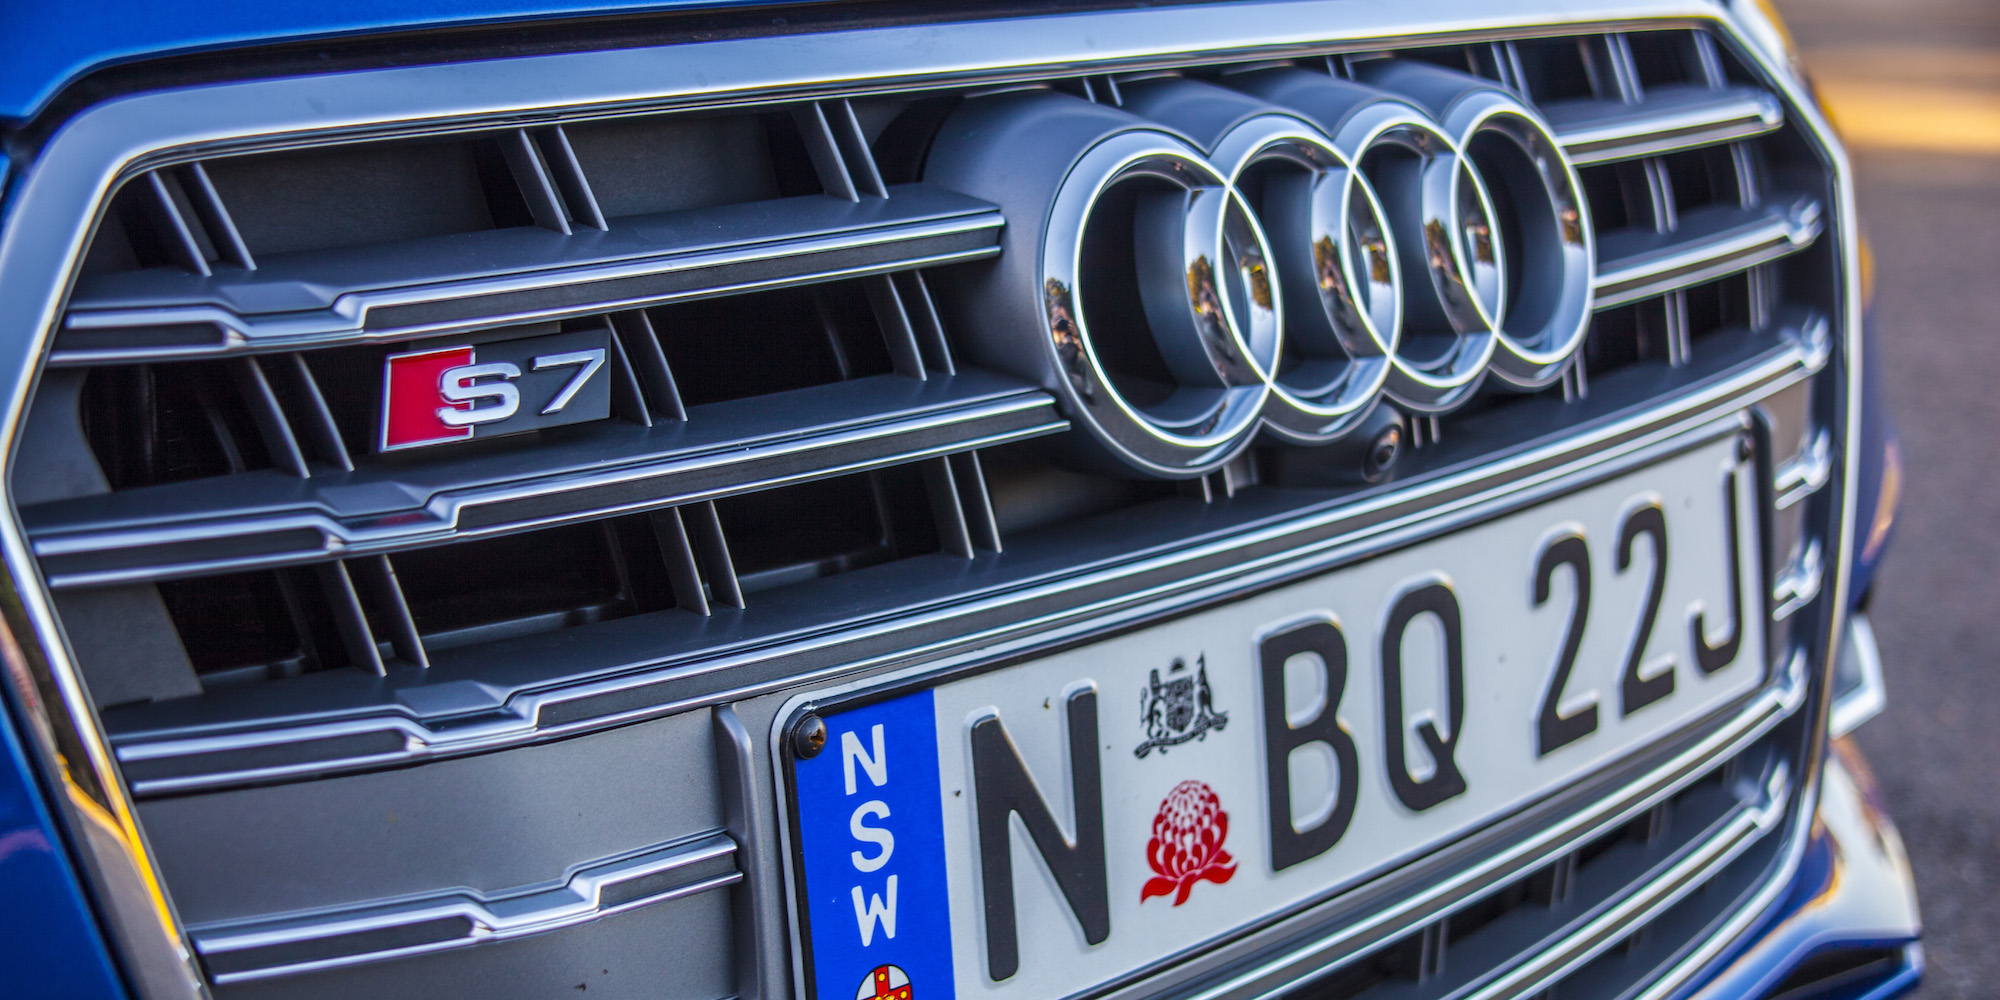 2016 Audi S7 Grille